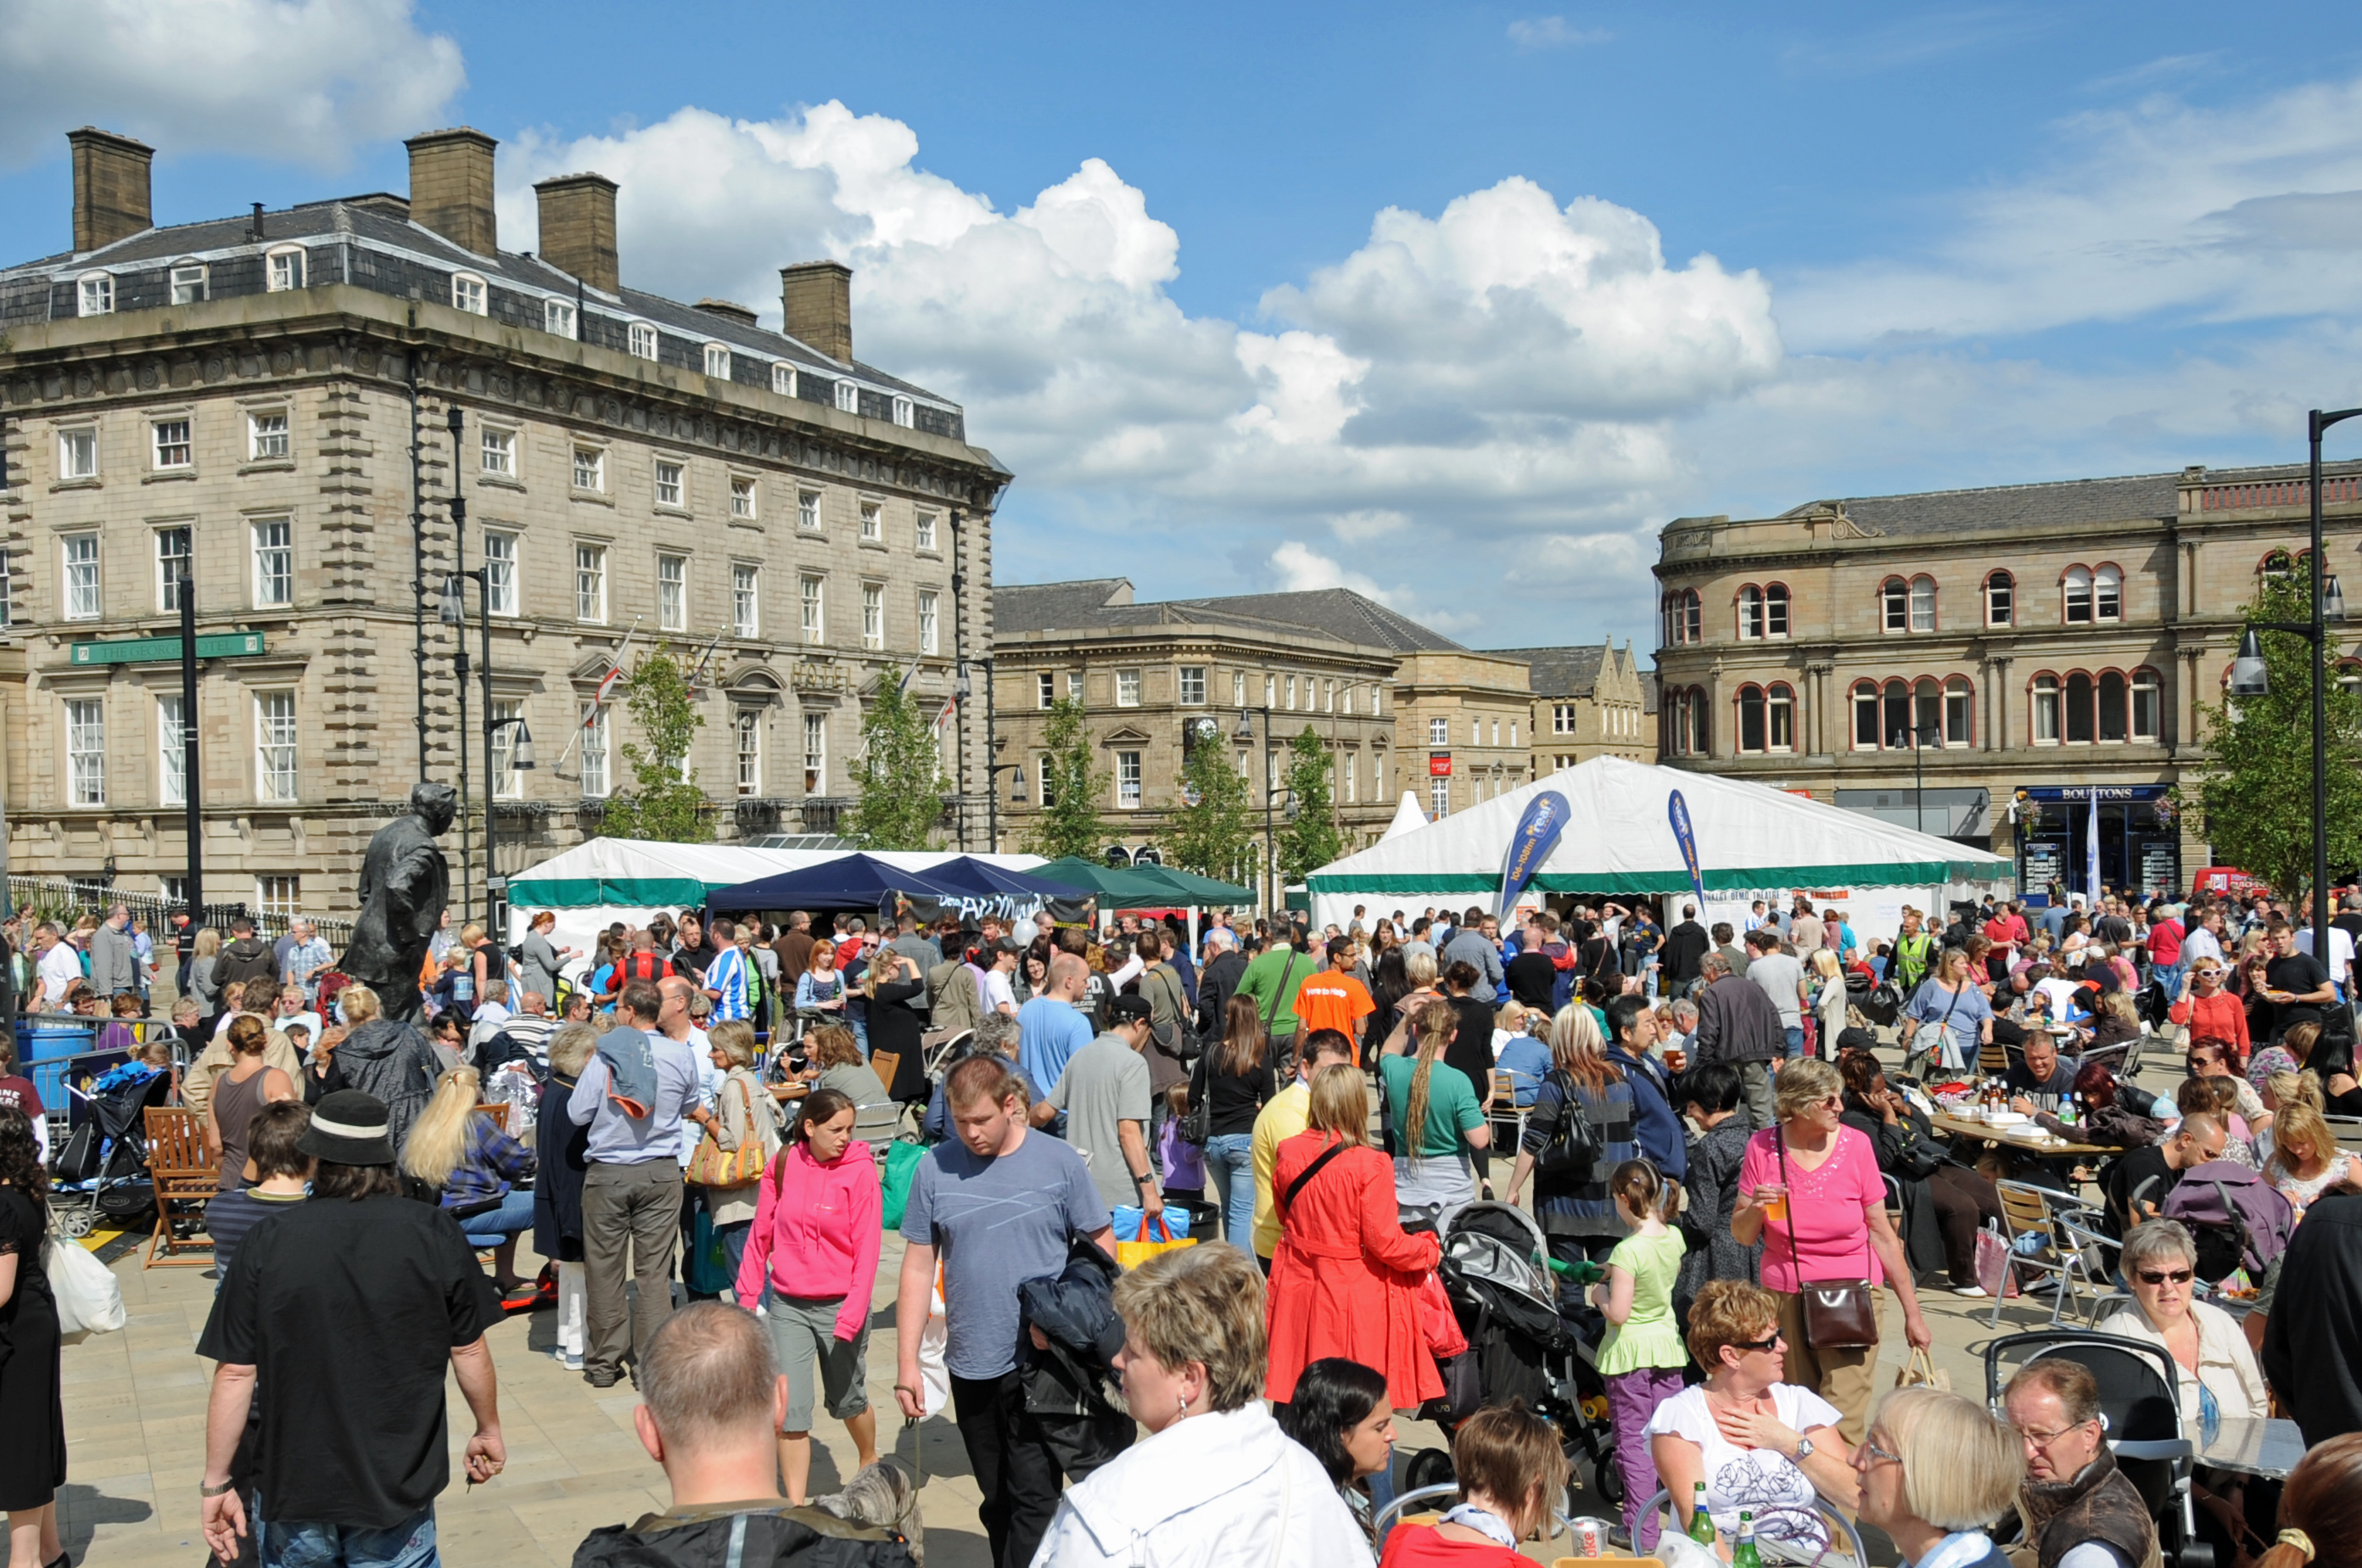 DG60541. Crowds. Huddersfield food drink festival. 14.8.10.